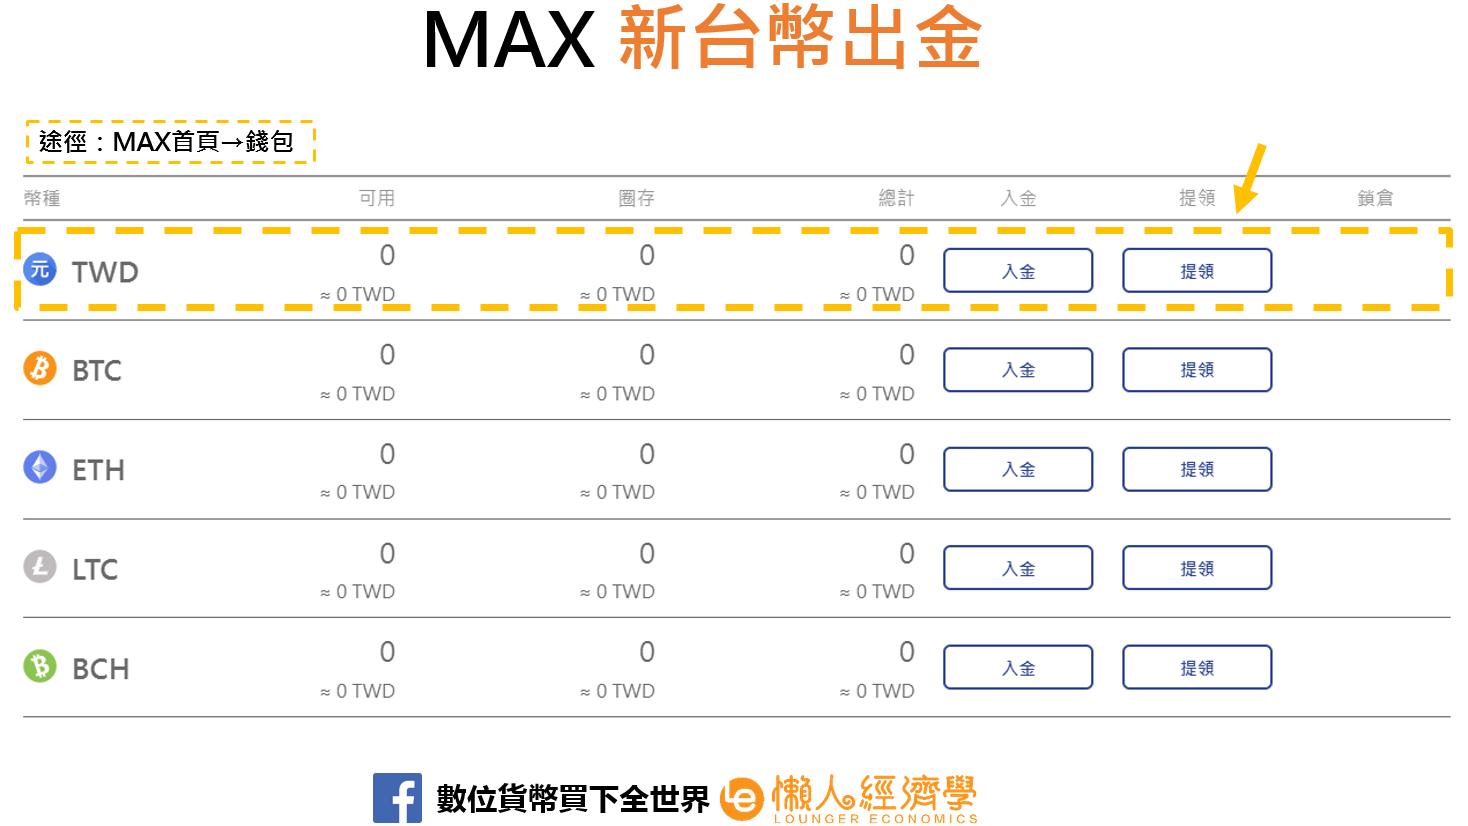 MAX新台幣出金